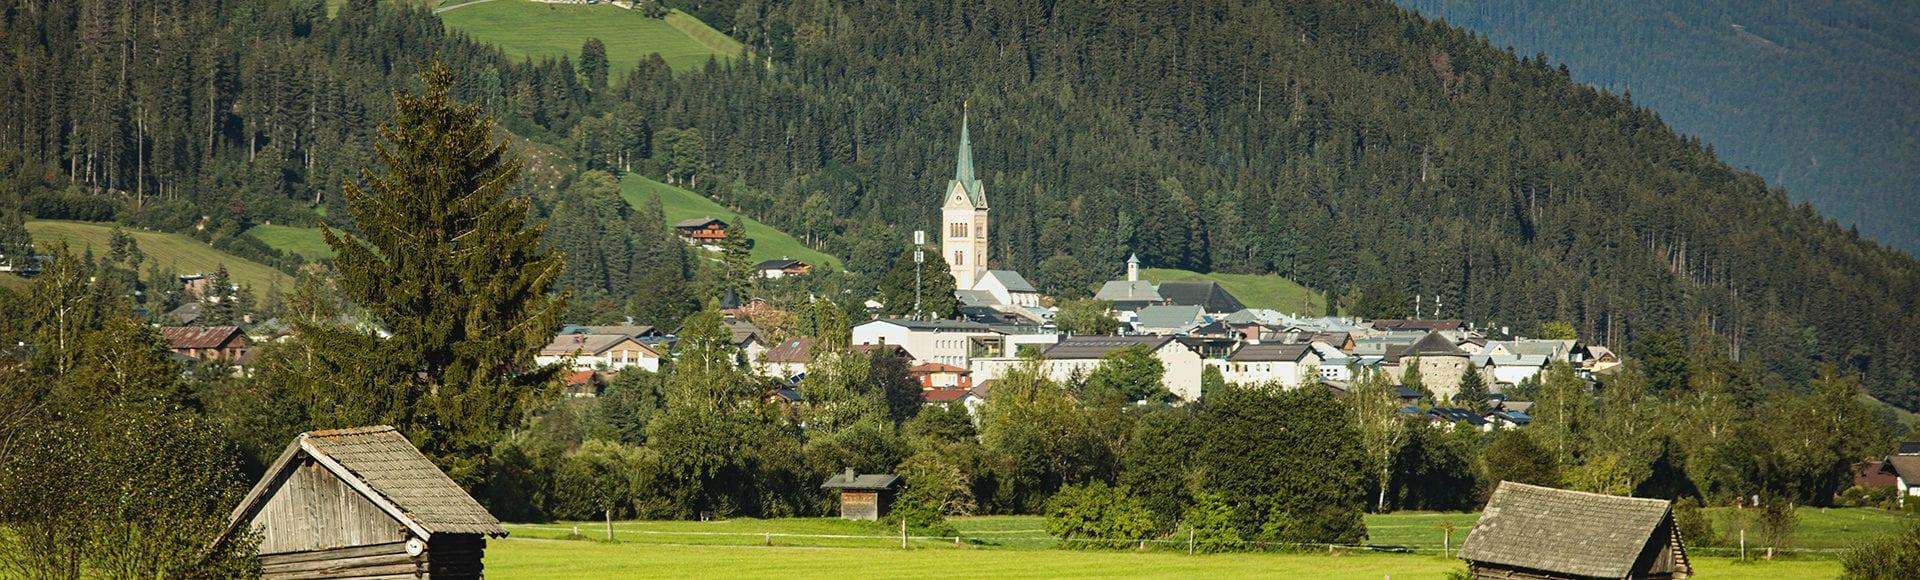 Sommer Radstadt